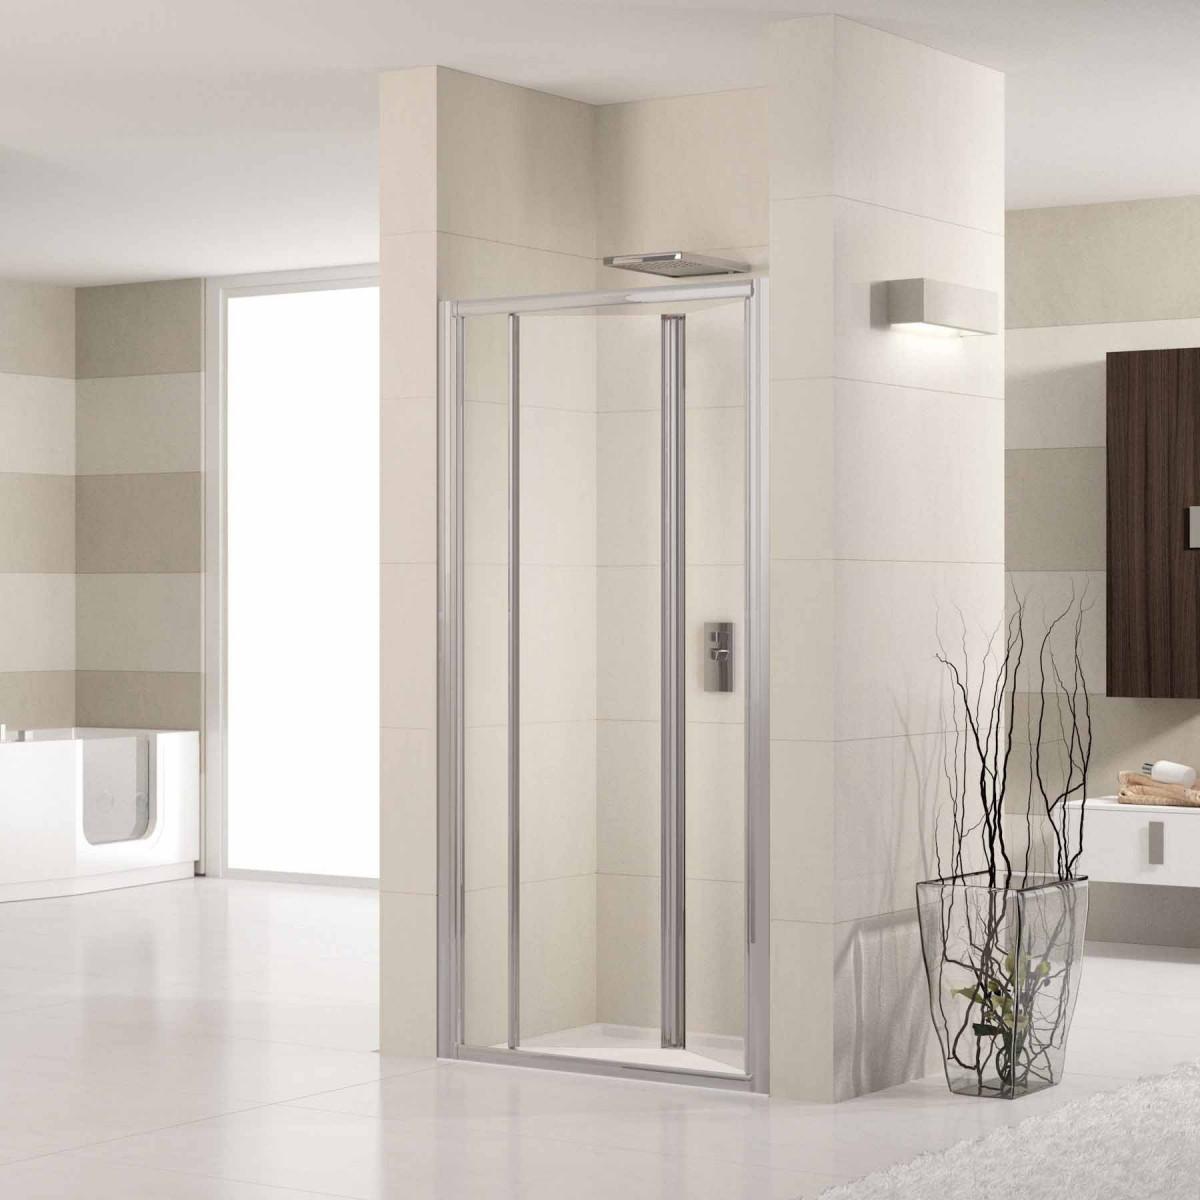 Novellini lunes 900mm bifold shower door luness84 for Novellini shower doors